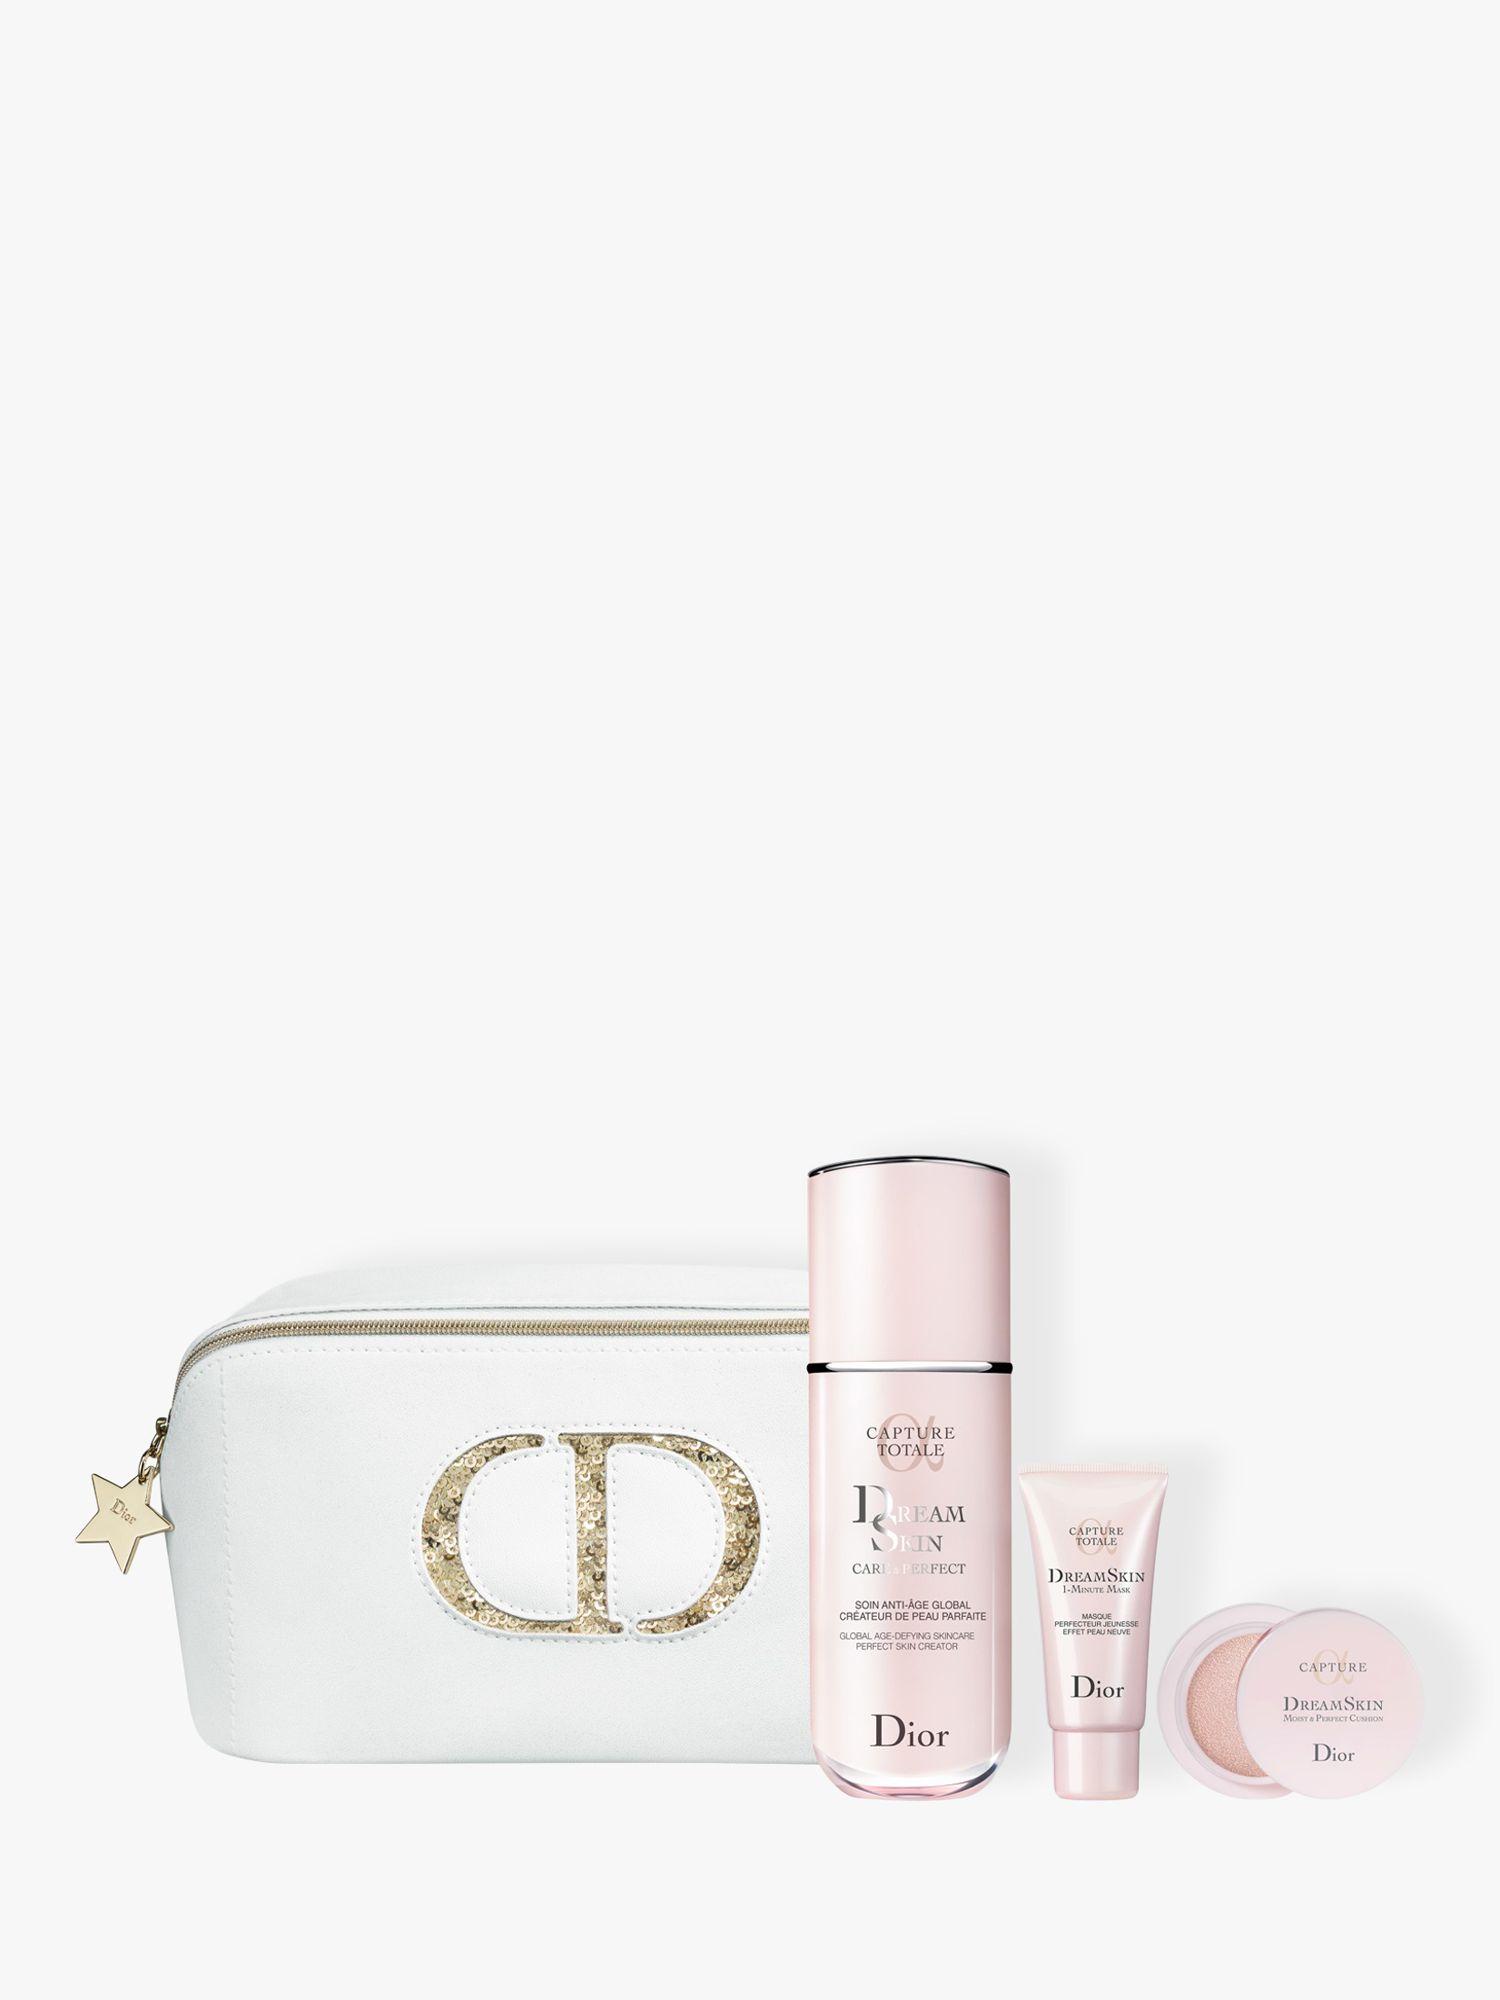 Dior Dreamskin Gift Box Skincare Gift Set At John Lewis Partners